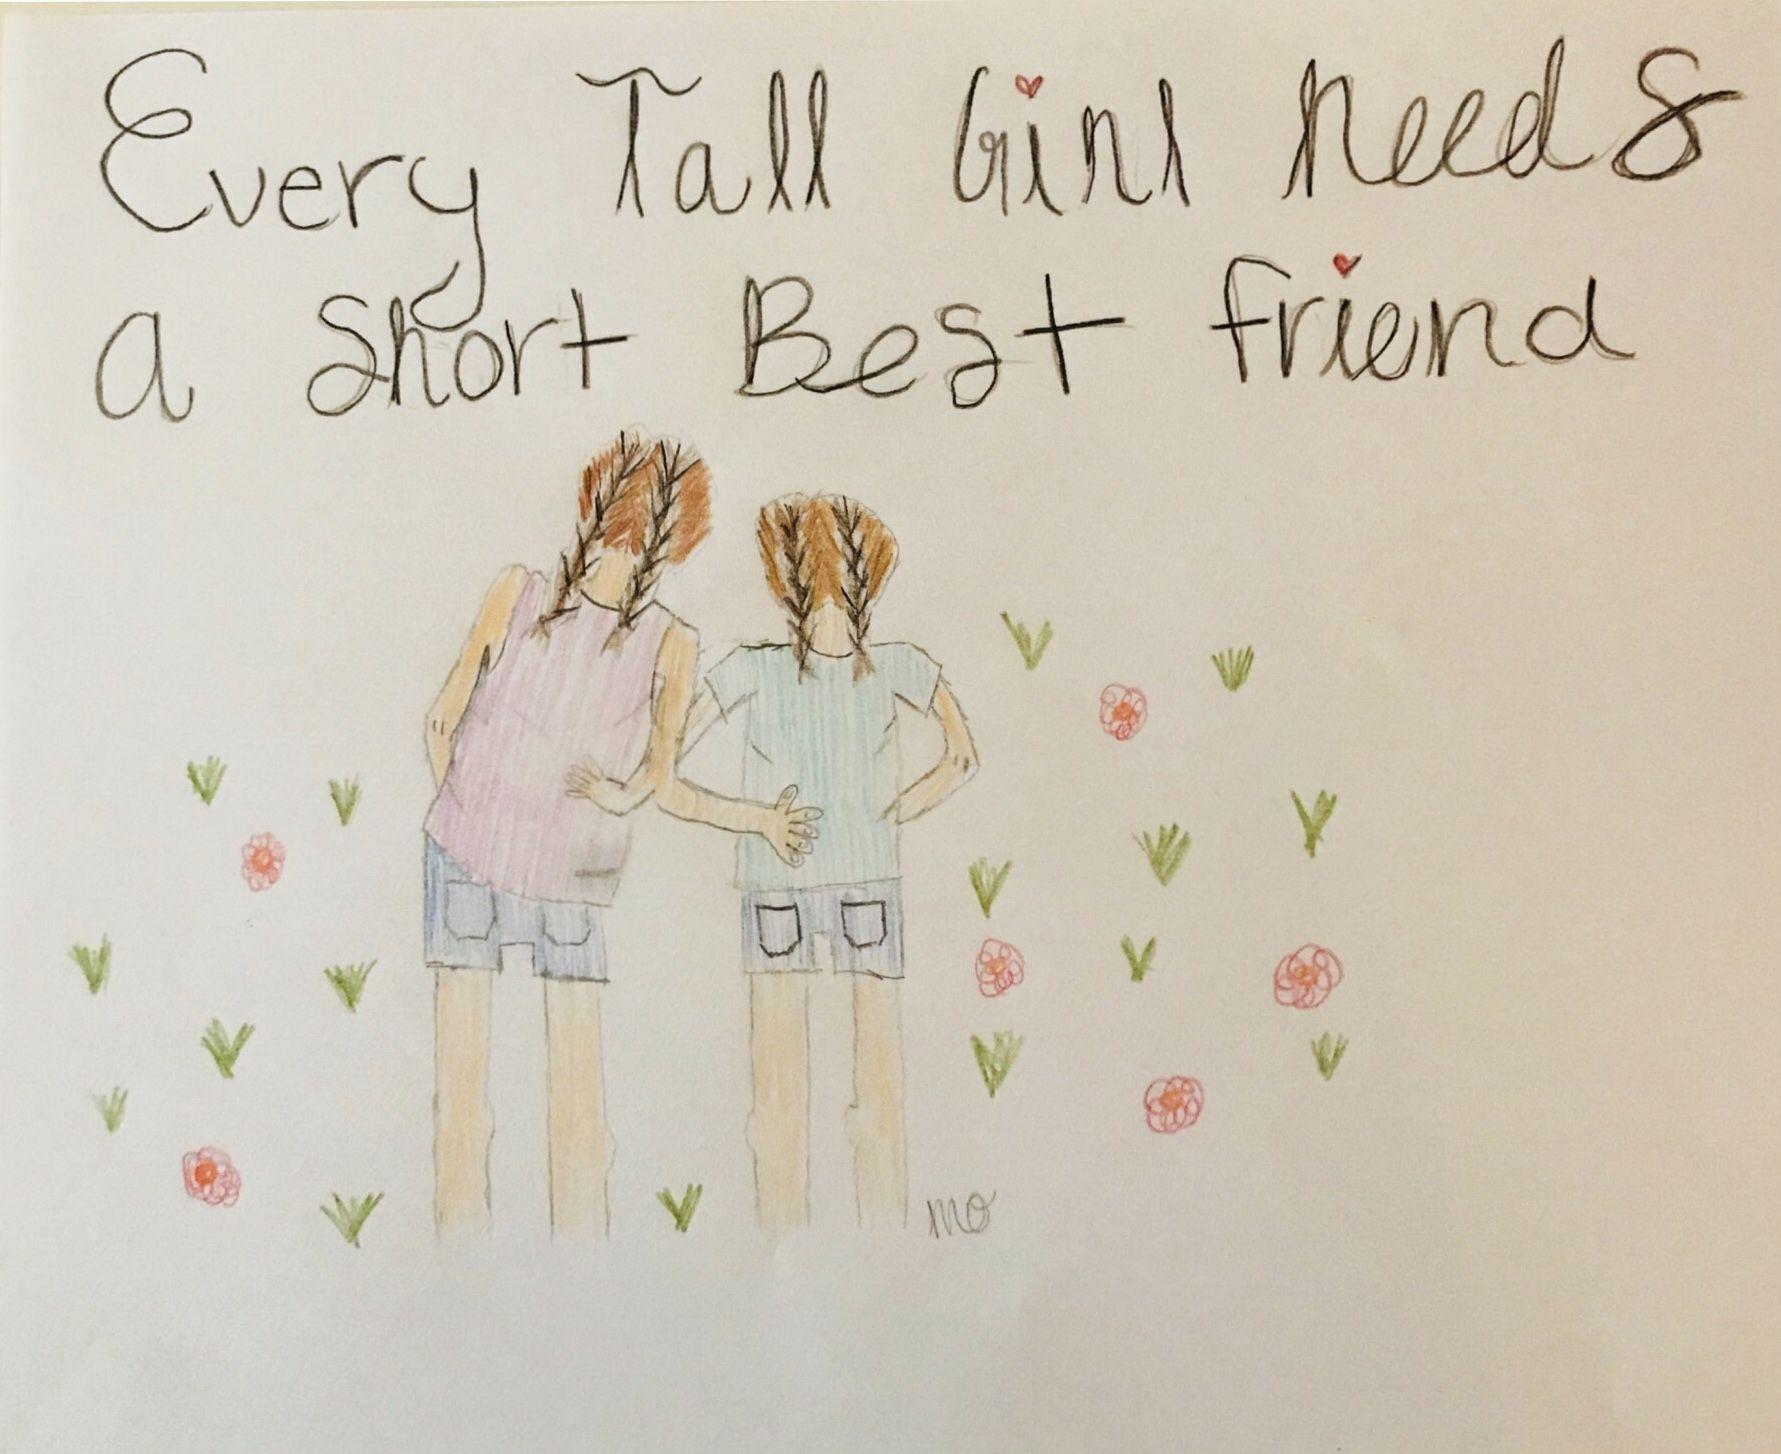 Pin By Bree On Crafty Best Friend Drawings Drawings Of Friends